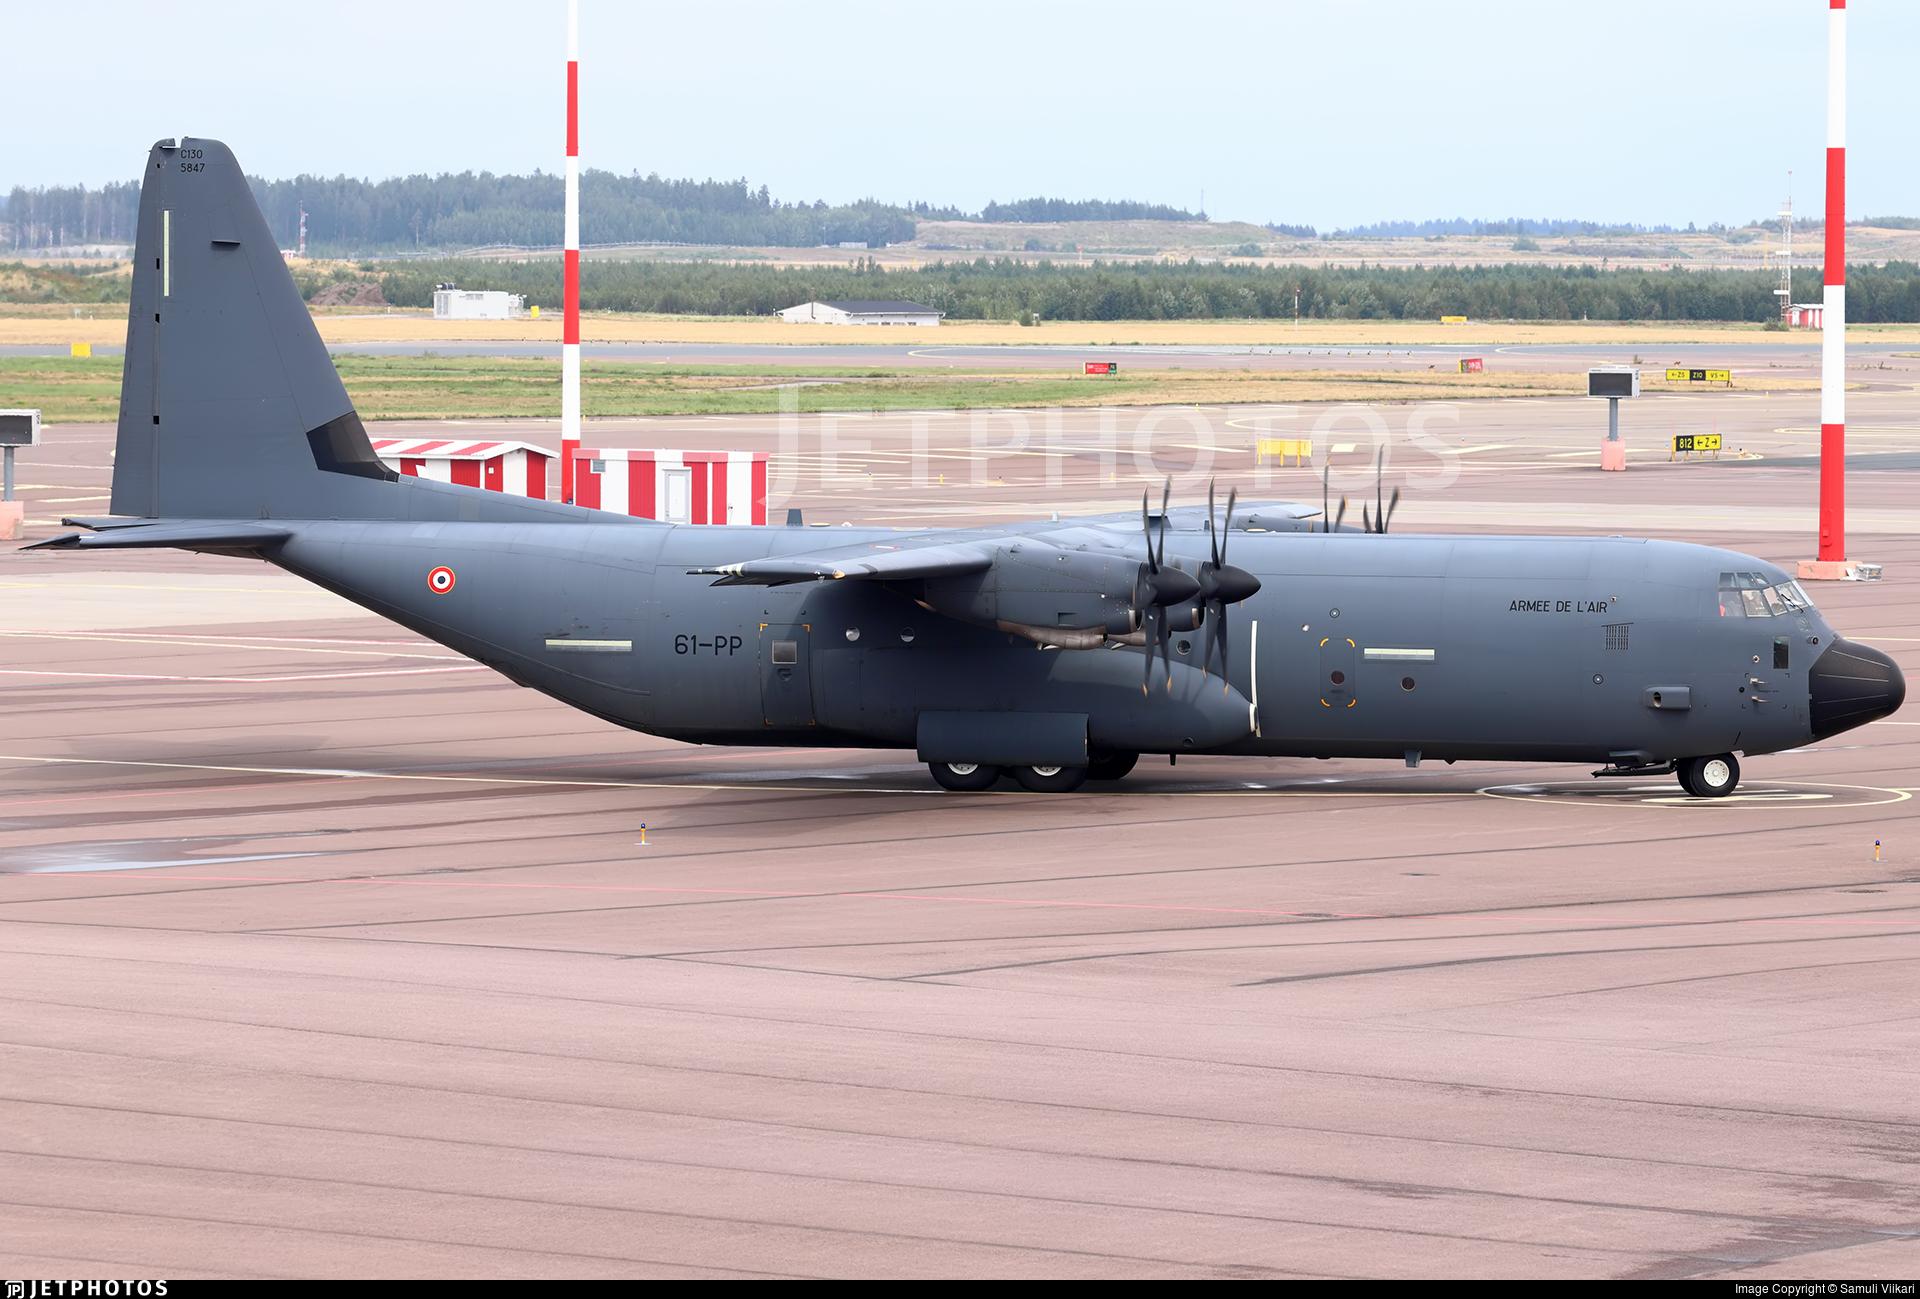 5847 - Lockheed Martin C-130J-30 Hercules - France - Air Force